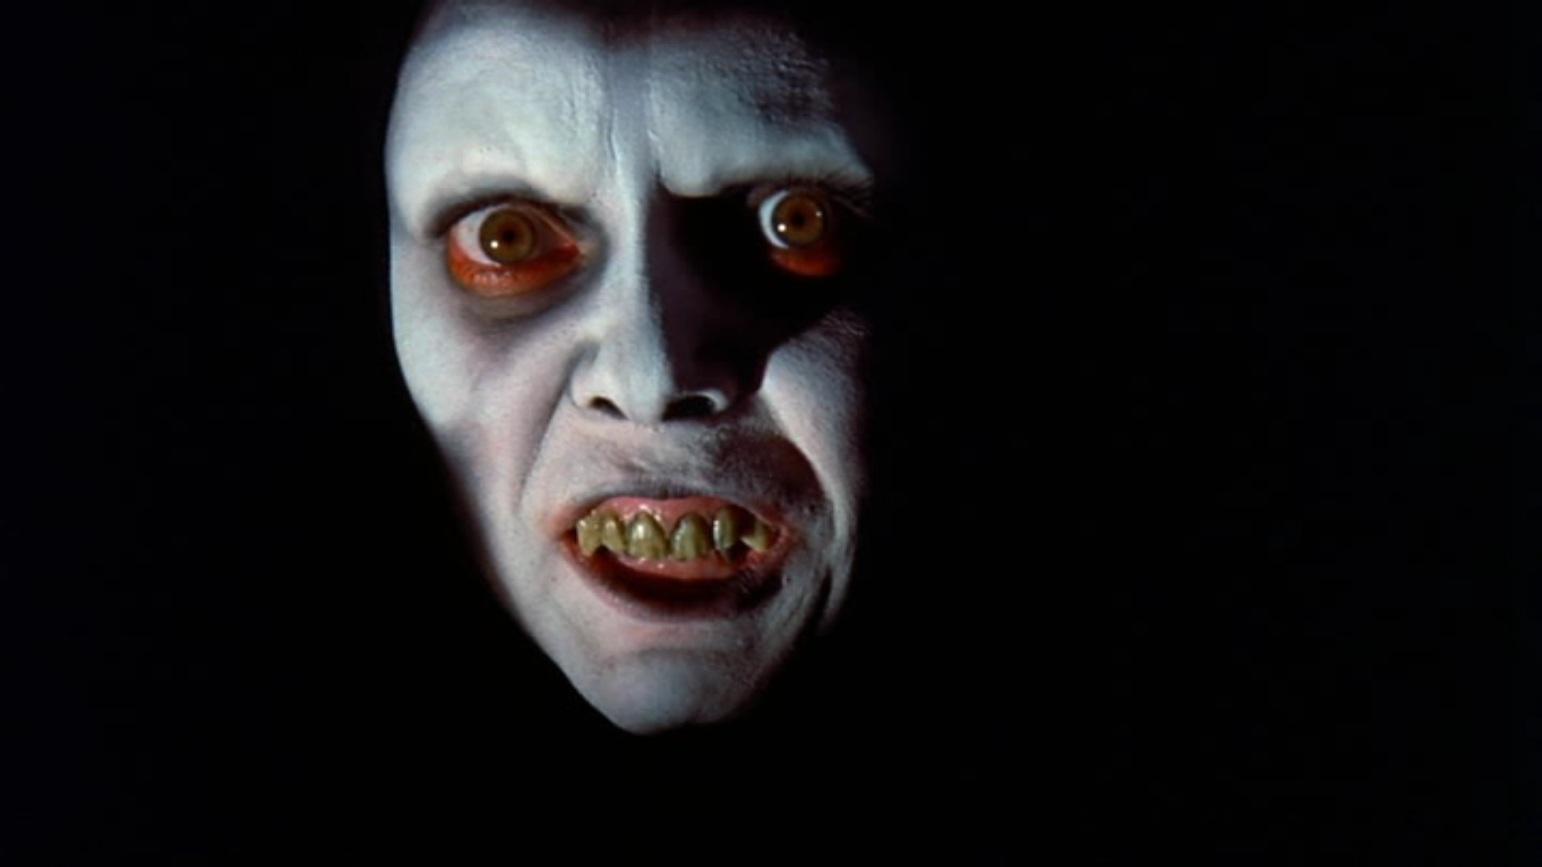 The Exorcist 13HERO MAGAZINE WEEKEND COMBO HALLOWEEN EXCORSIST MUSIC EAT LONDON DEATH JAKE GYLENHALL DONNIE DARKO ART HOGARTH